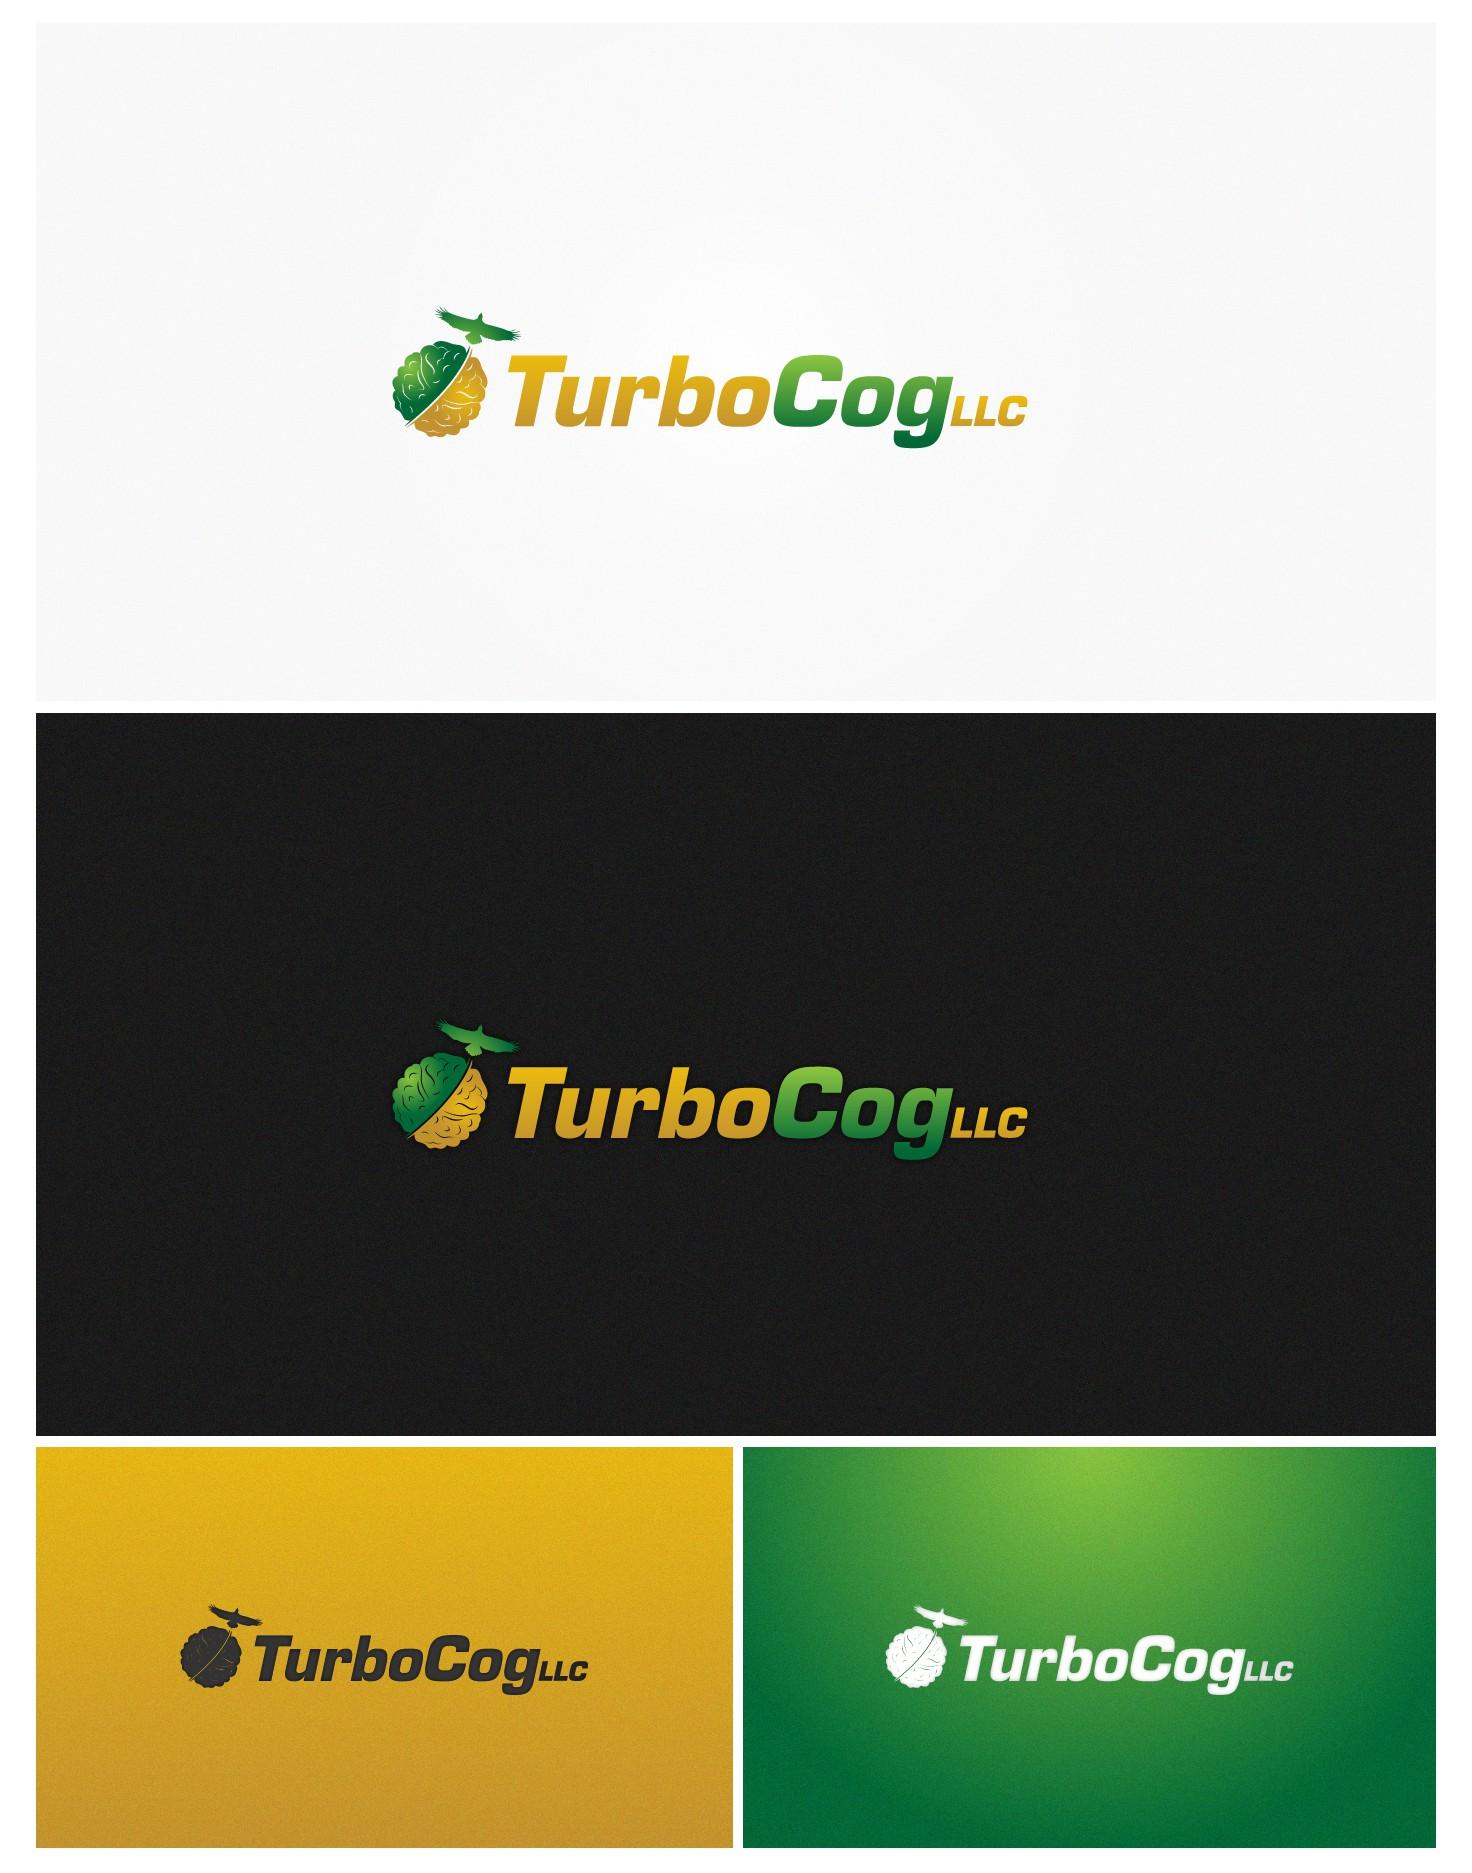 New logo wanted for TurboCog LLC